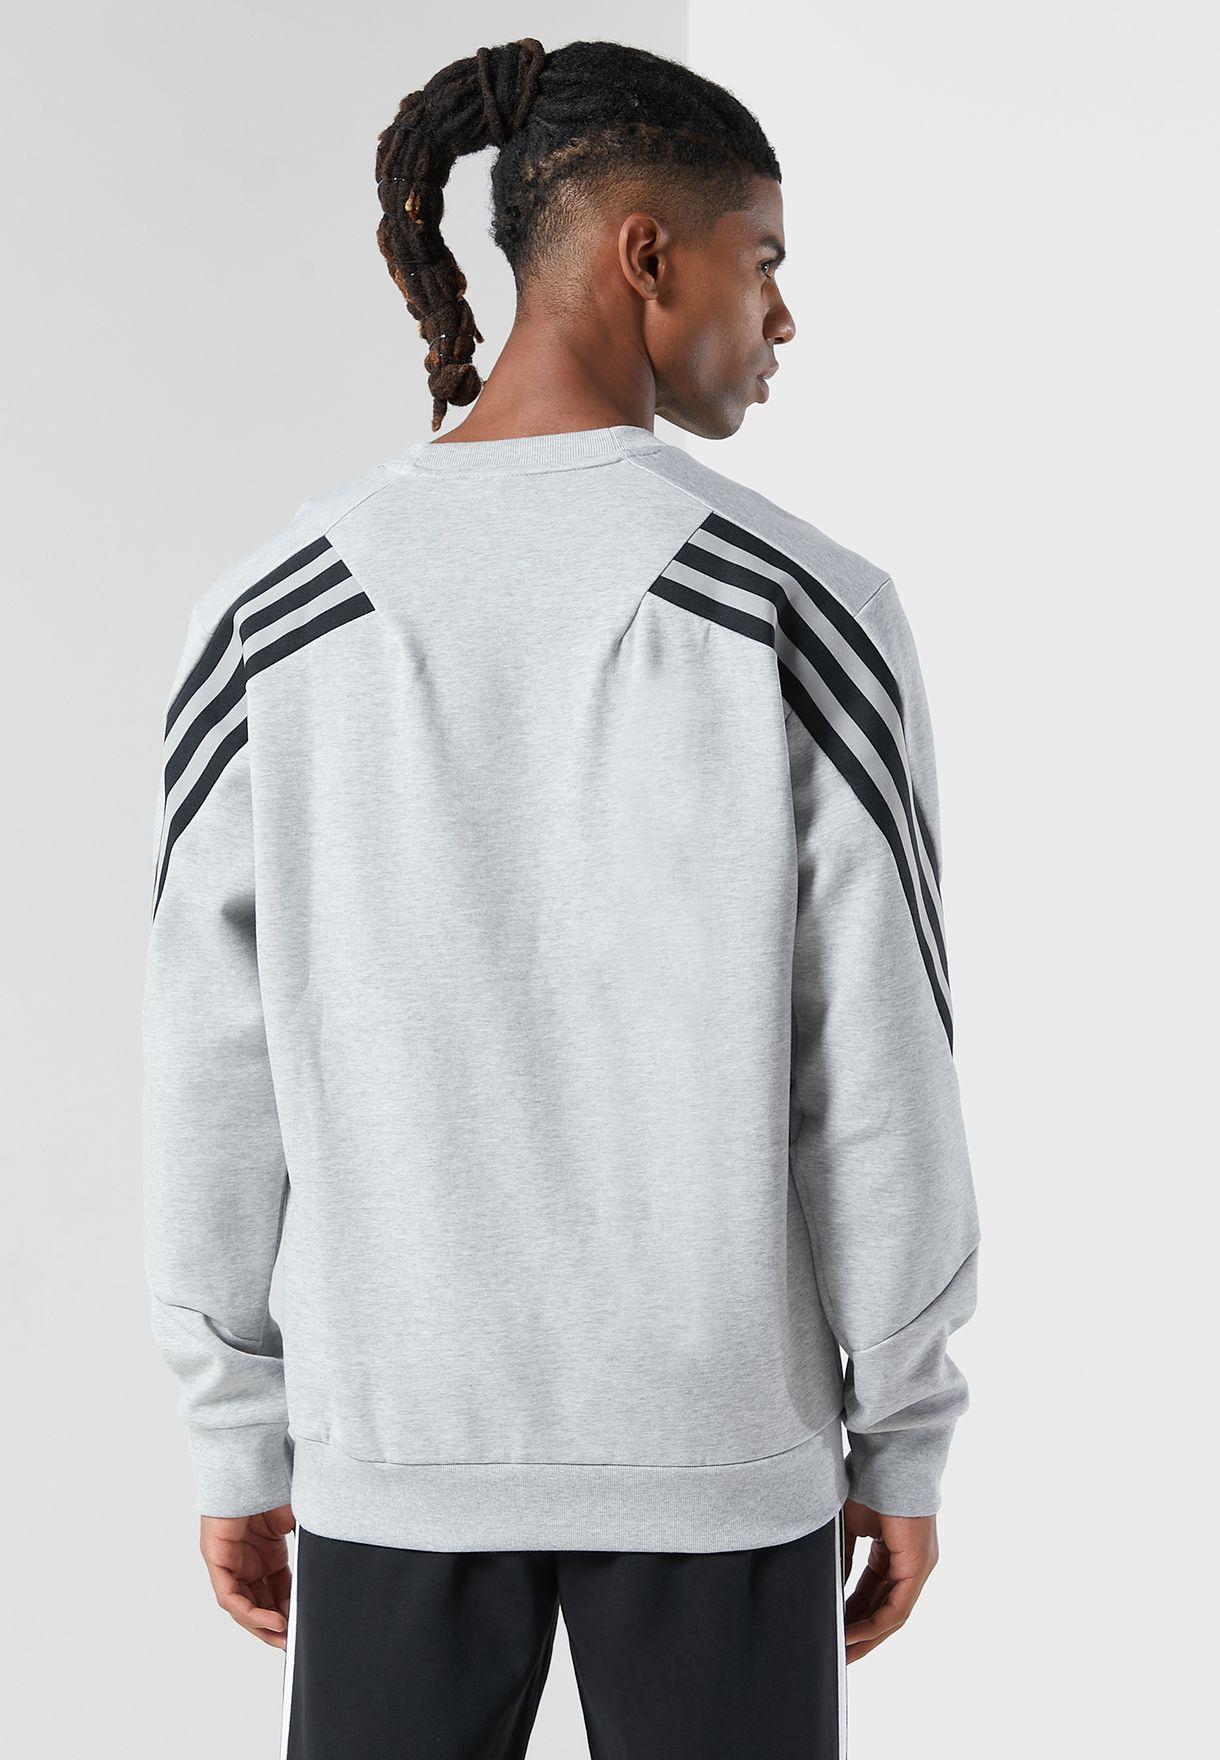 3 Stripe Future Icon Sweatshirt